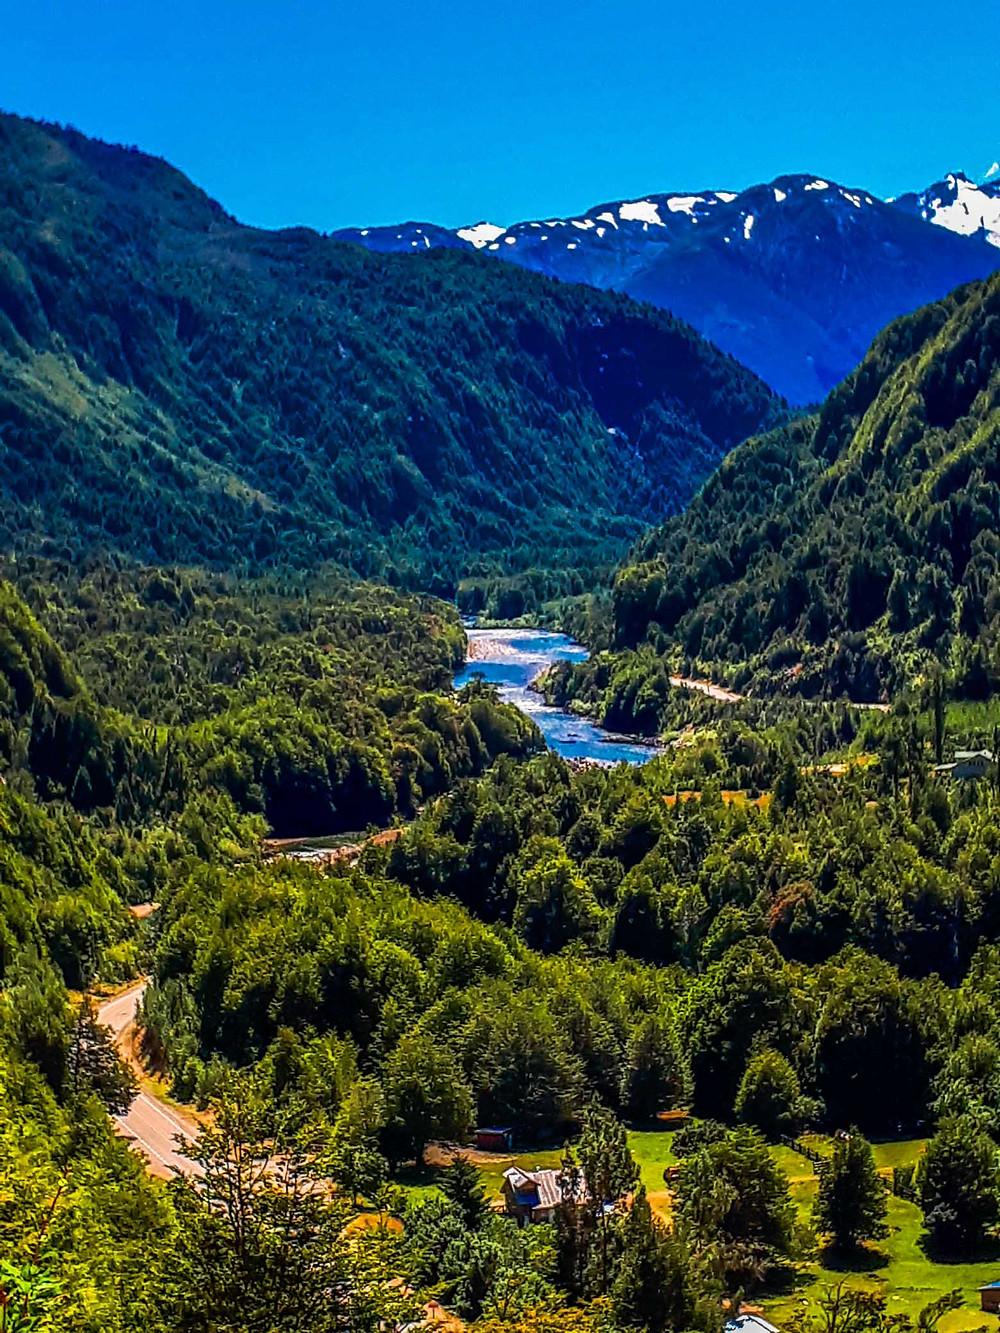 Stunning views are abundant on the Carretera Austral in Chile - AvVida.co.uk